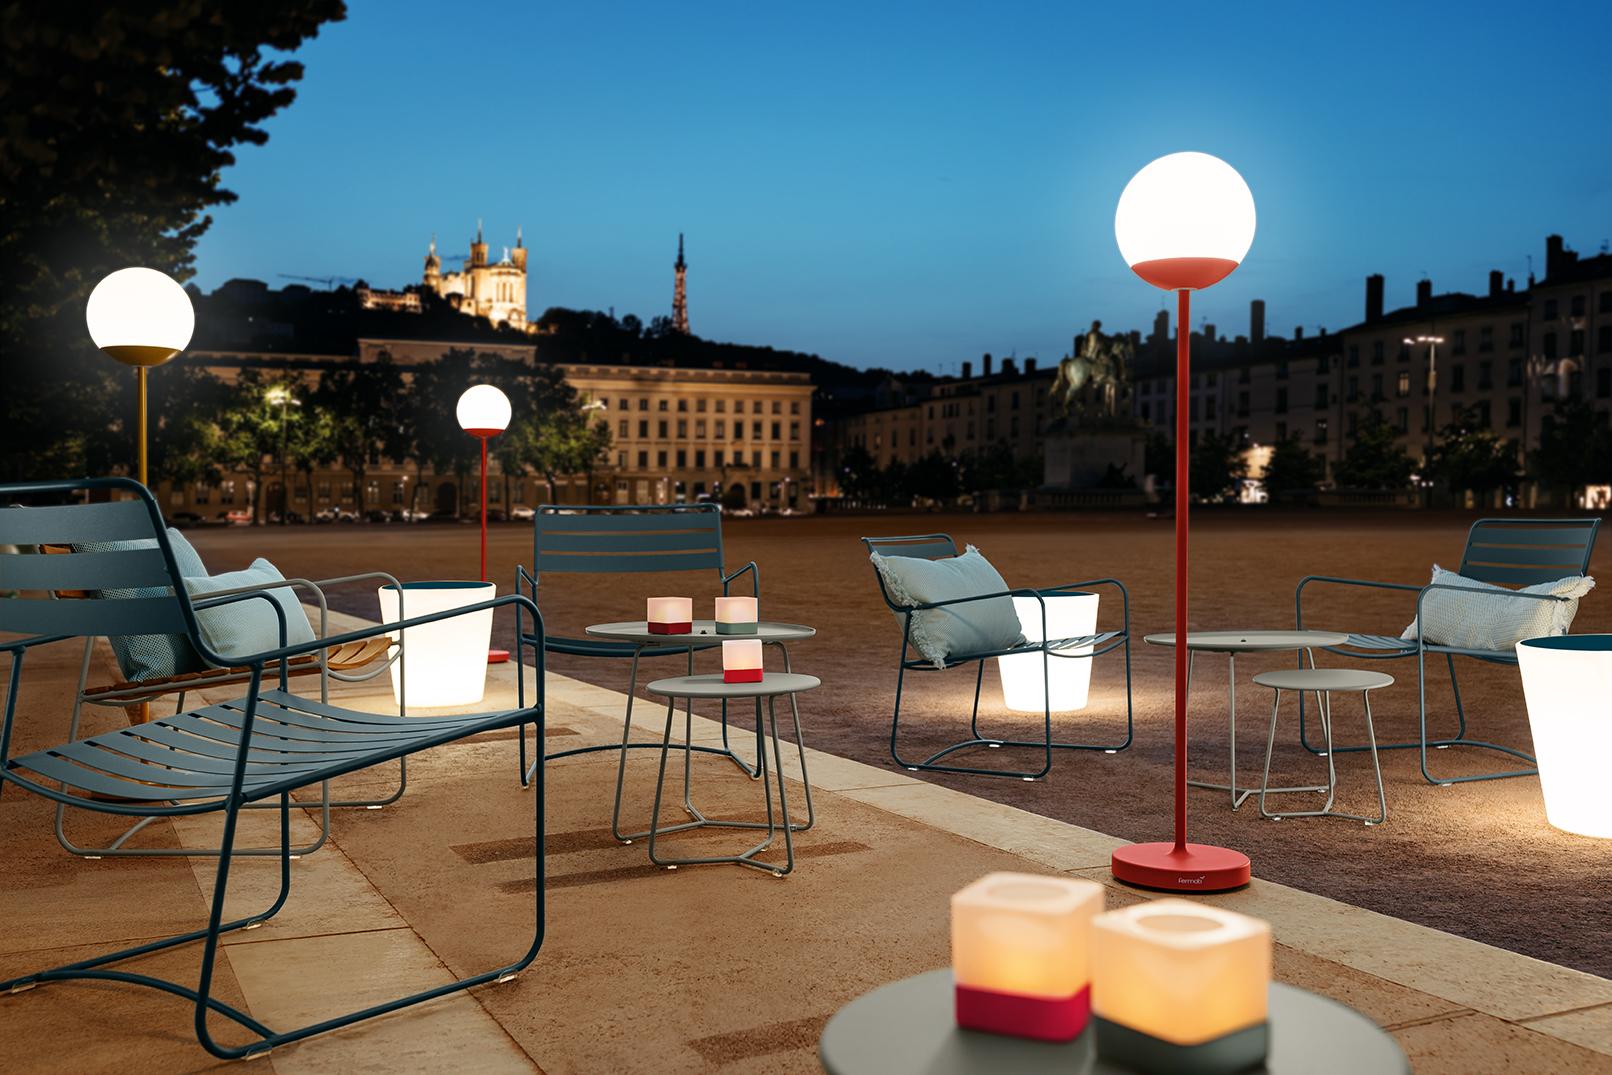 fauteuil metal, metal armchair, fermob armchair, outdoor furniture, mobilier exterieur, terrasse restaurant, terrasse hotel